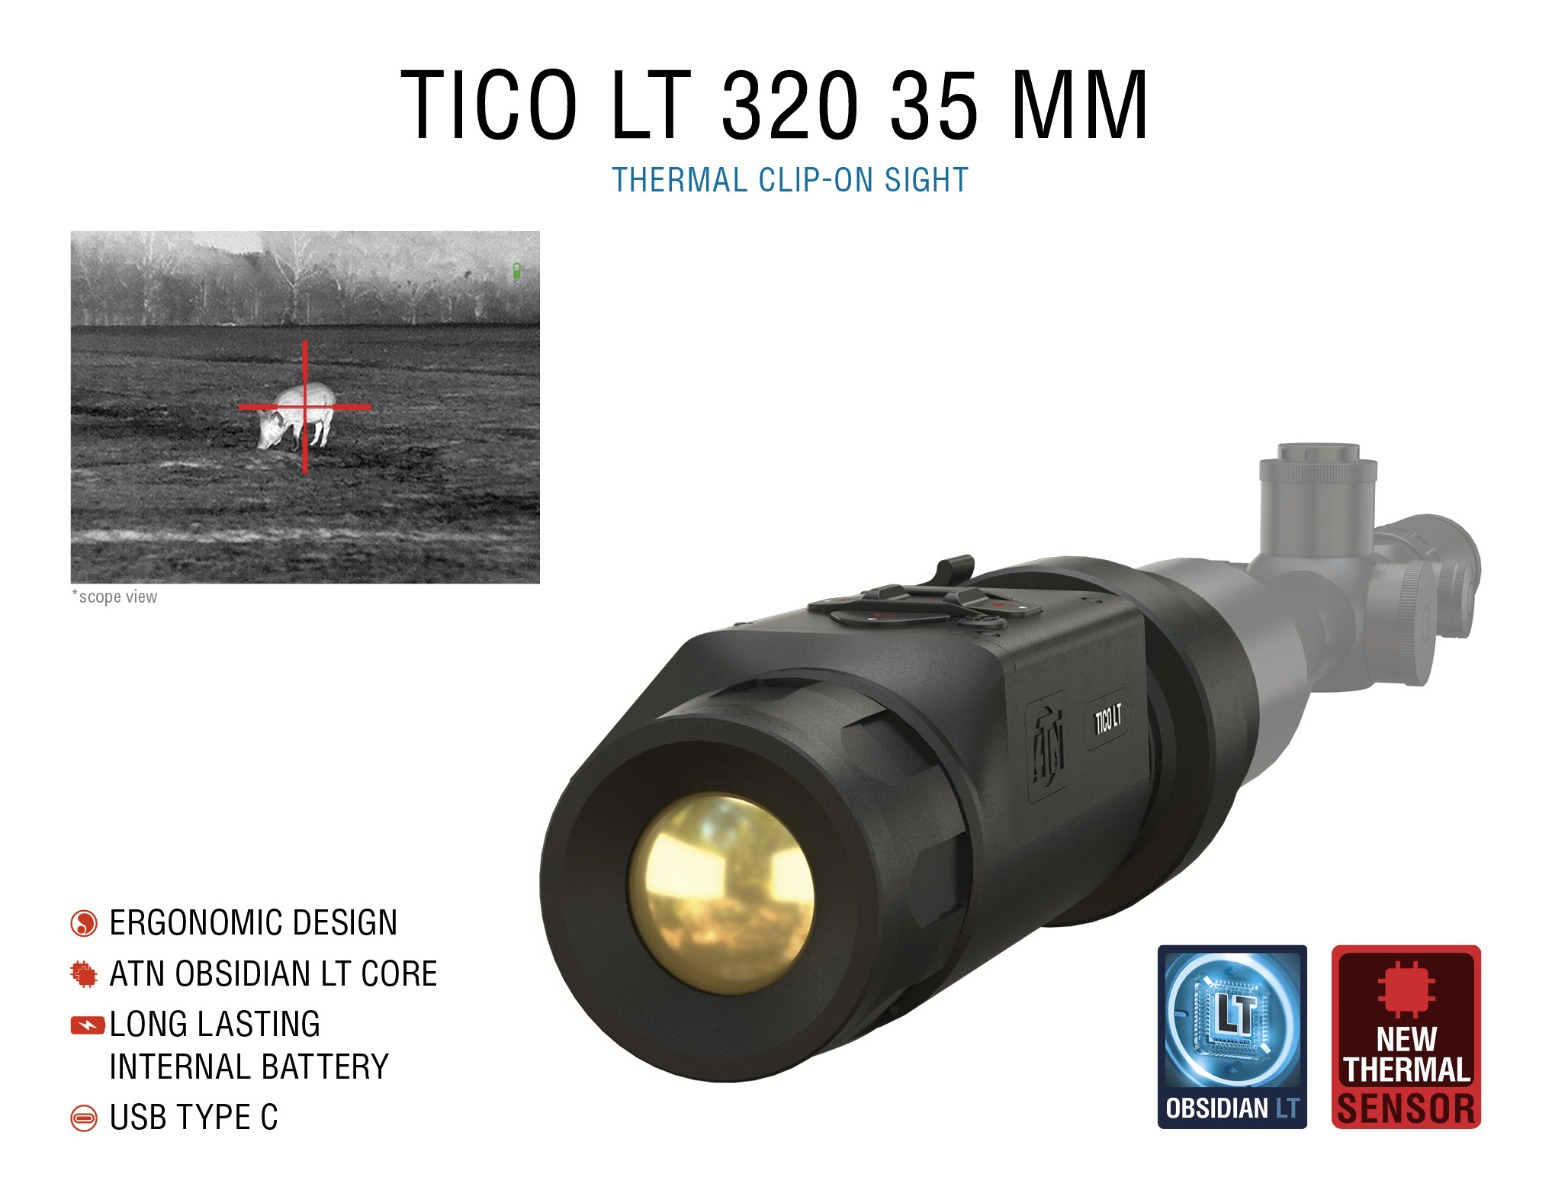 TICOTLT335X Thermal Imaging Sight   Night Vision Guys